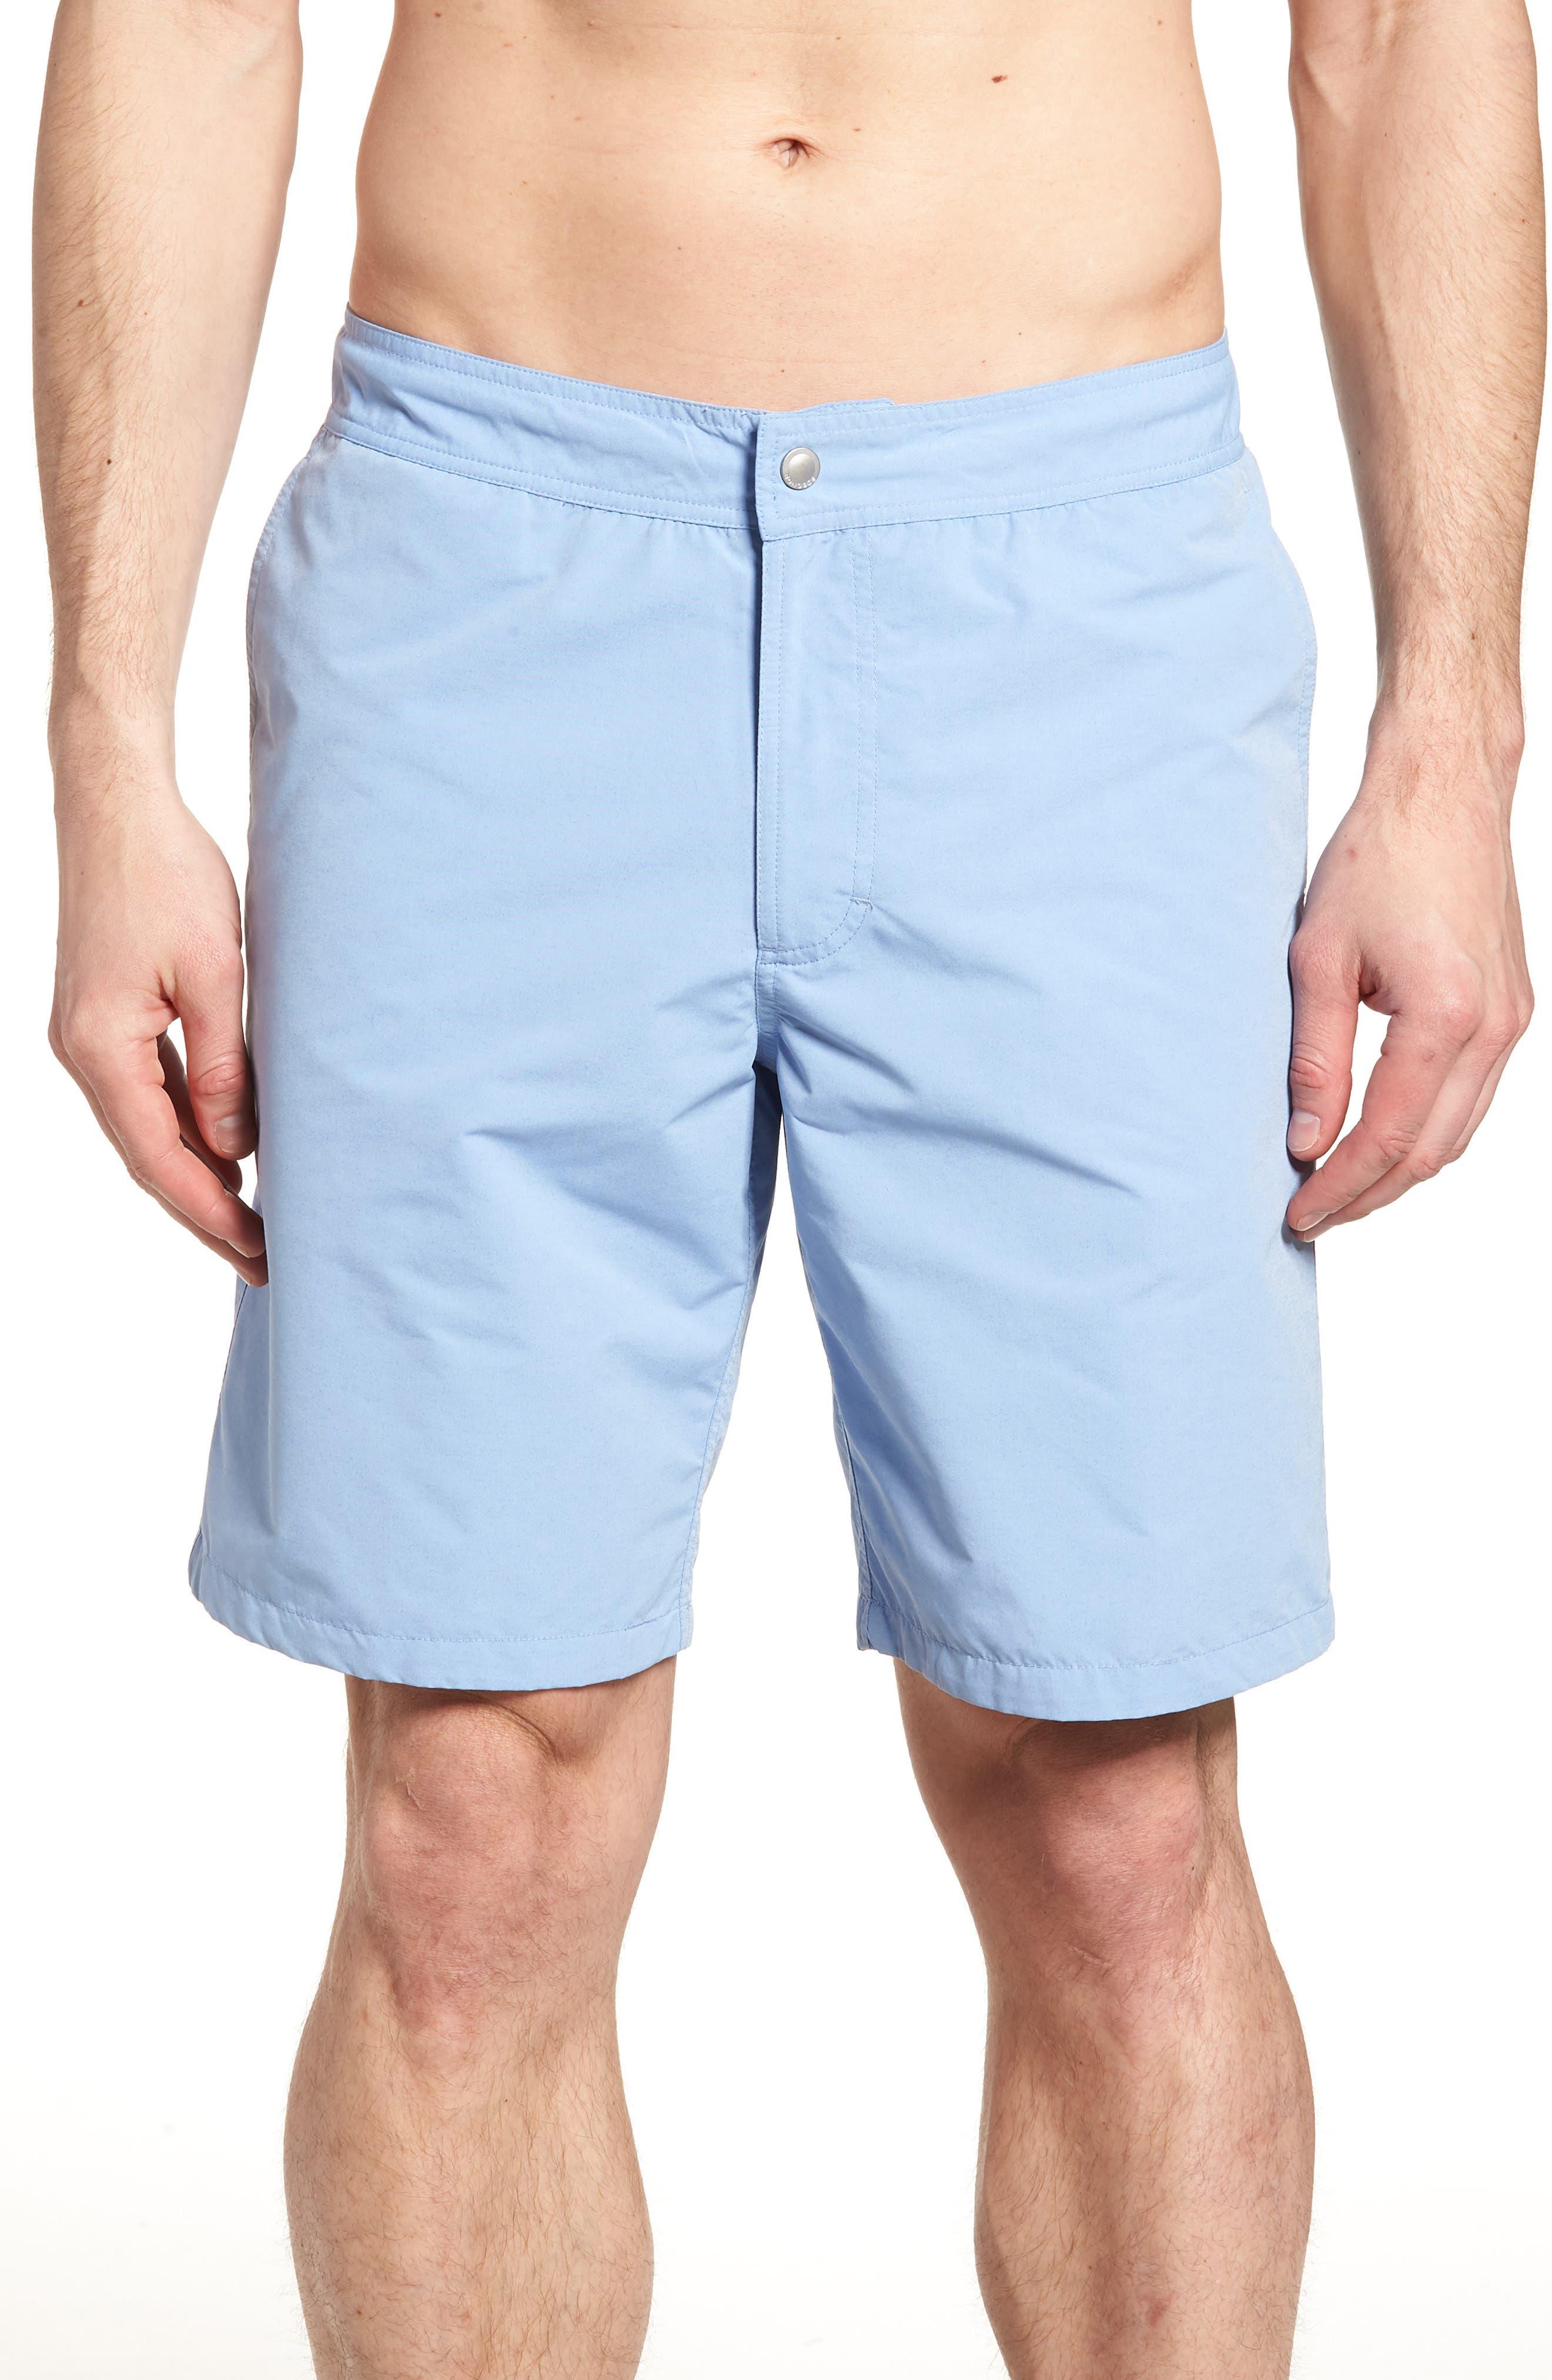 Banzai 9-Inch Swim Trunks,                         Main,                         color, Blue Chambray